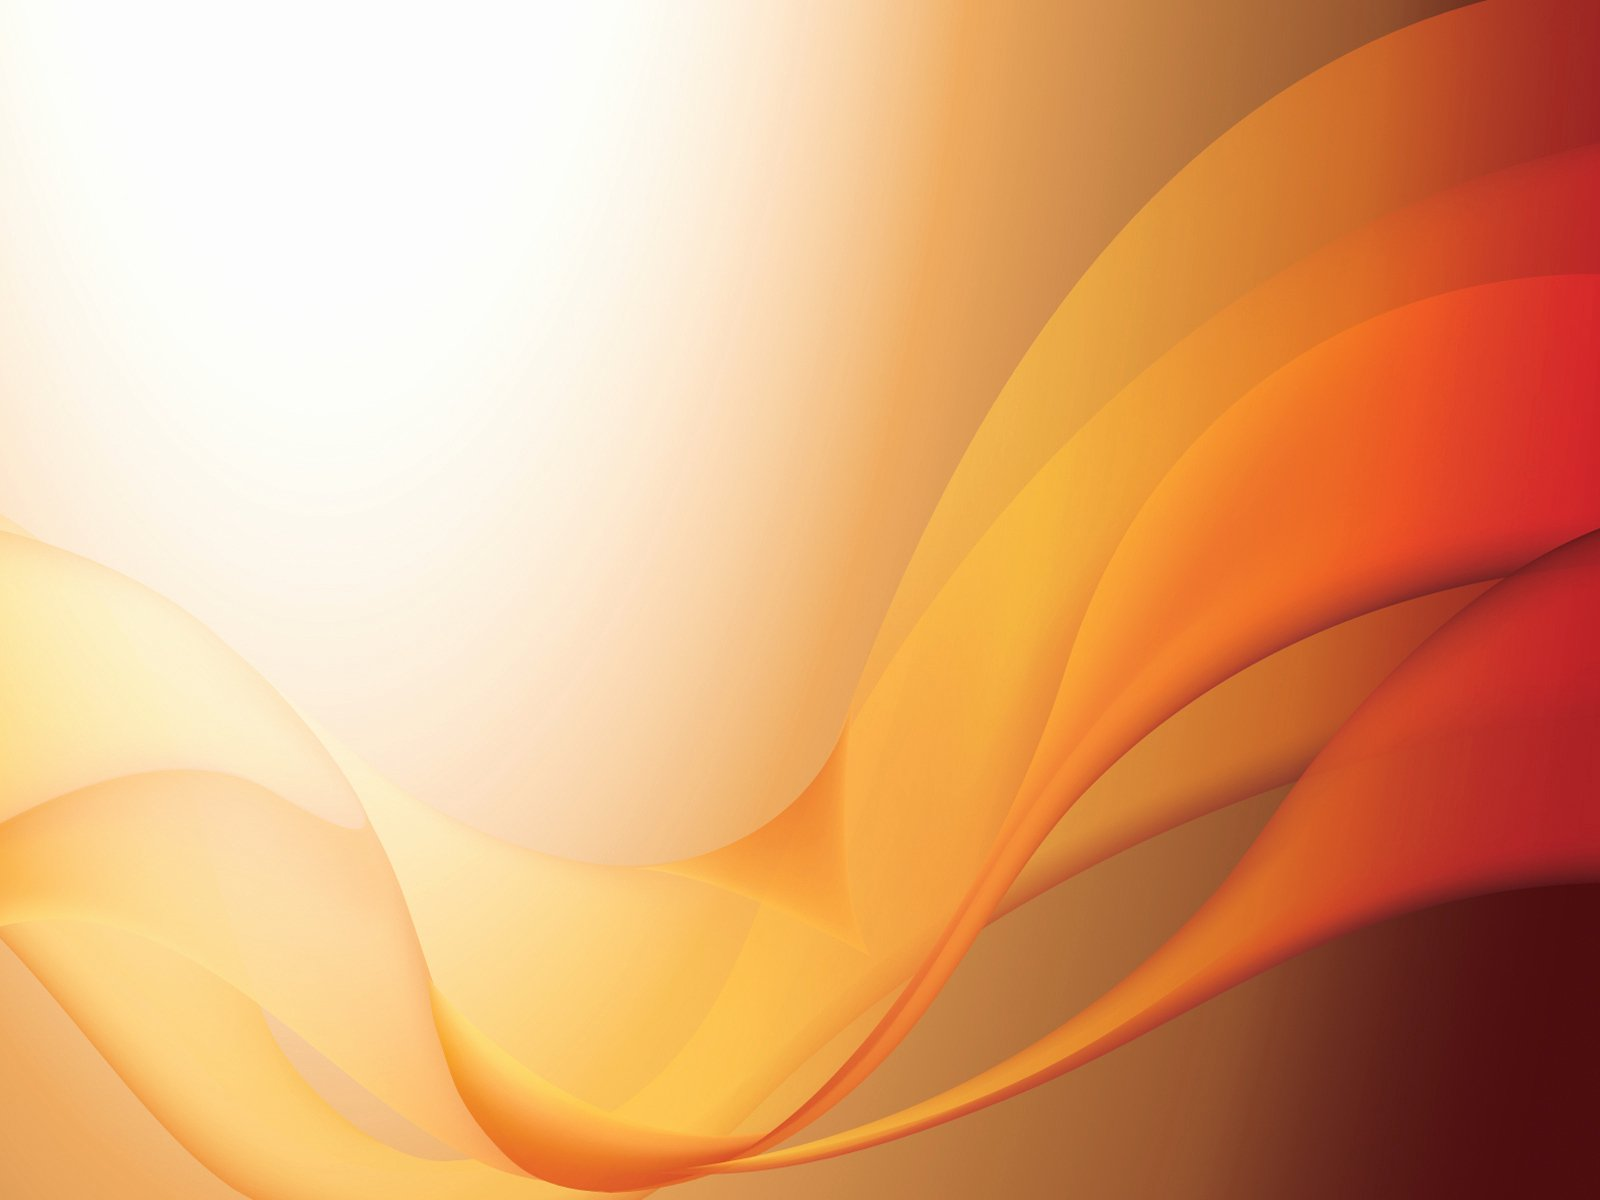 Orange Waves Powerpoint Templates Abstract orange